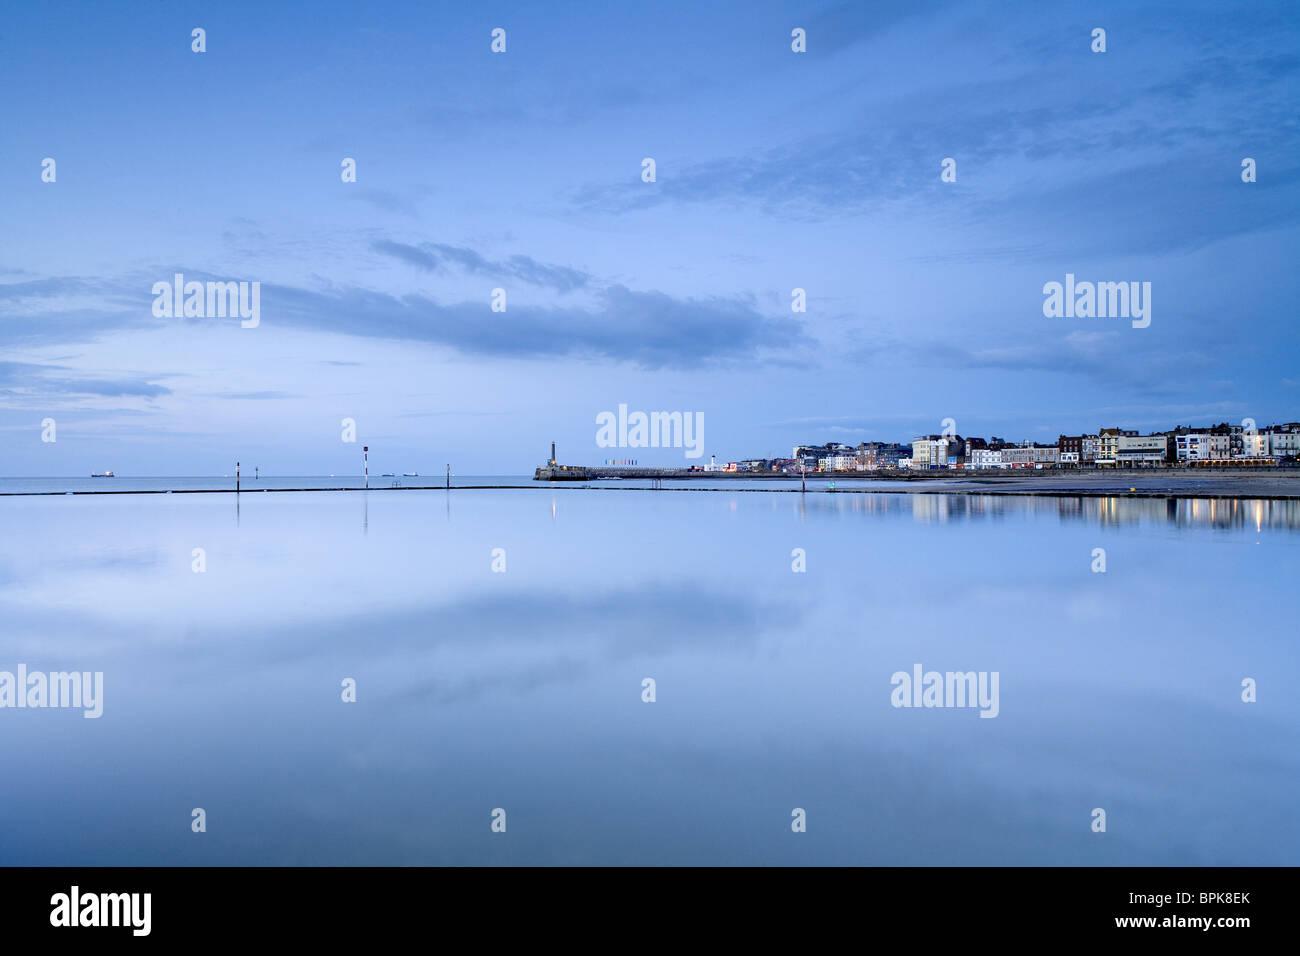 Ville balnéaire de Margate, Kent, Angleterre, Grande-Bretagne, Europe Photo Stock